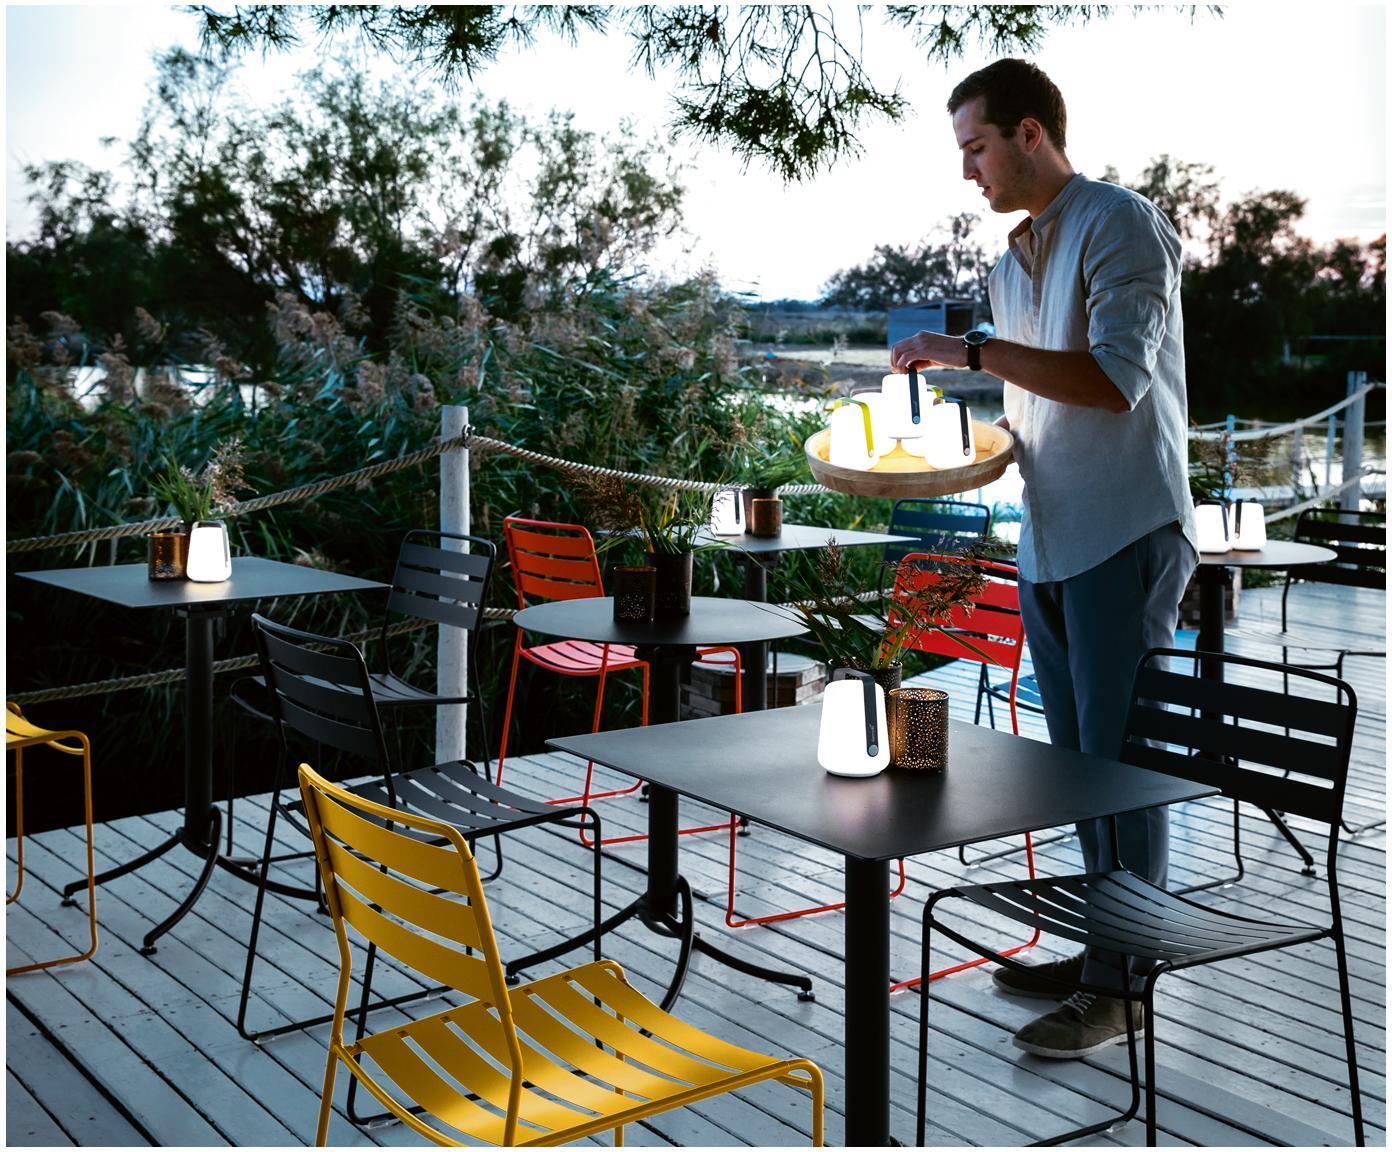 Mobiele outdoor LED lampen Balad, 3 stuks, Lampenkap: polyethyleen, Lichtgroen, Ø 10 x H 13 cm